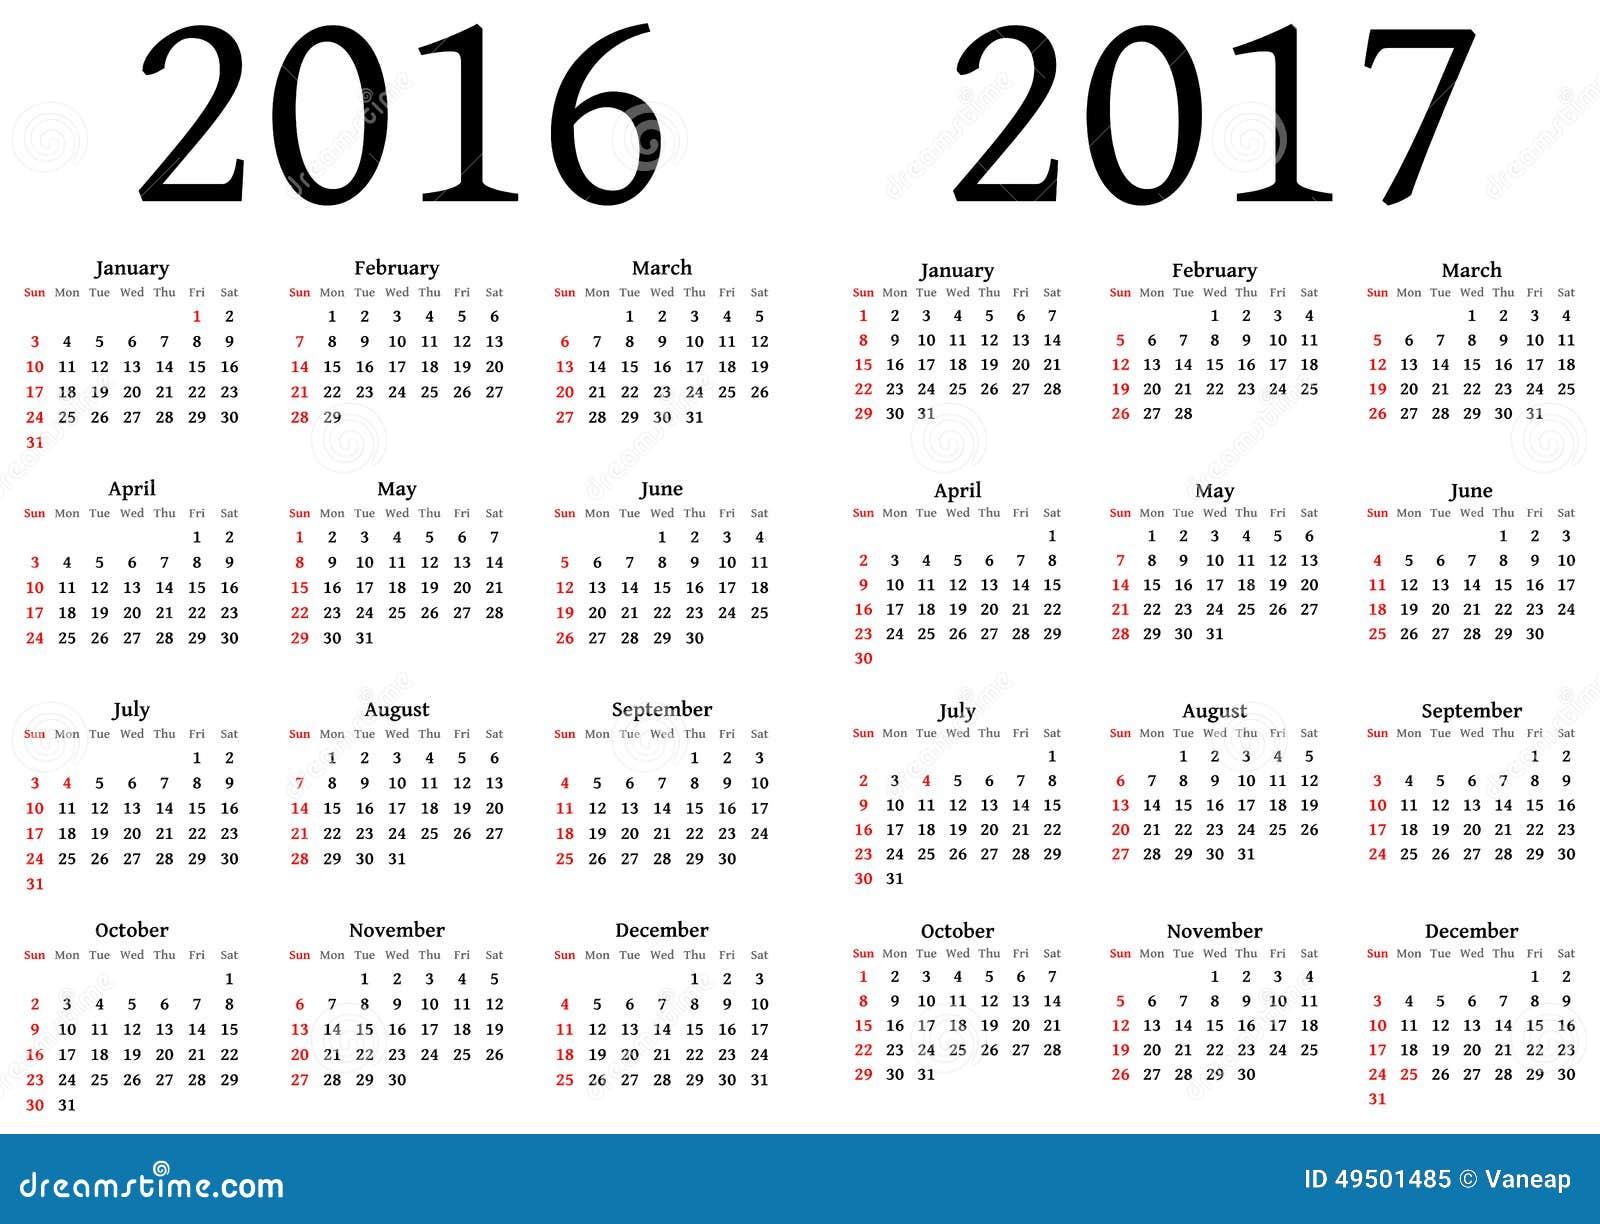 kalender f r 2016 und 2017 vektor abbildung illustration. Black Bedroom Furniture Sets. Home Design Ideas